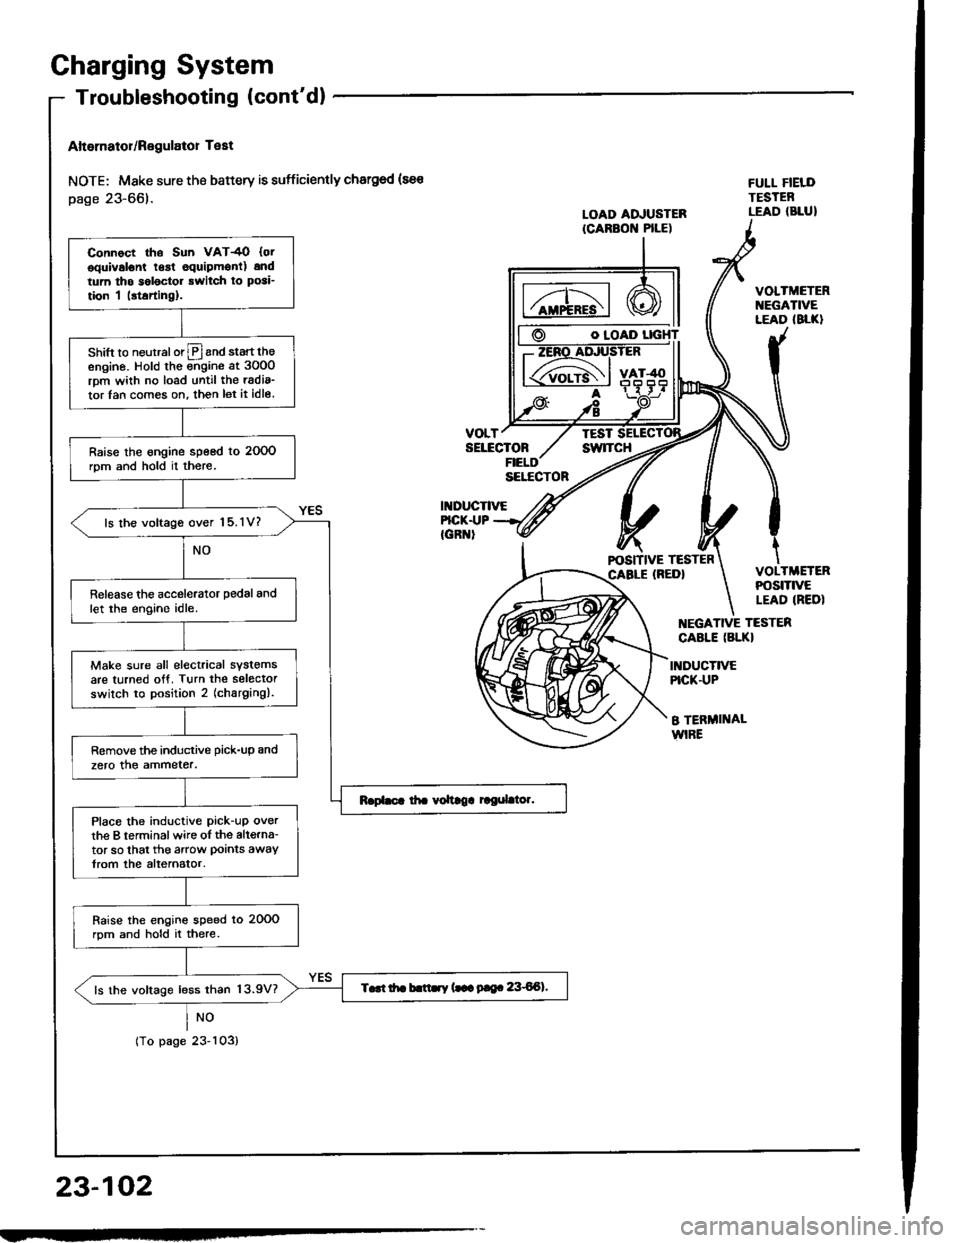 HONDA INTEGRA 1994 4.G Workshop Manual